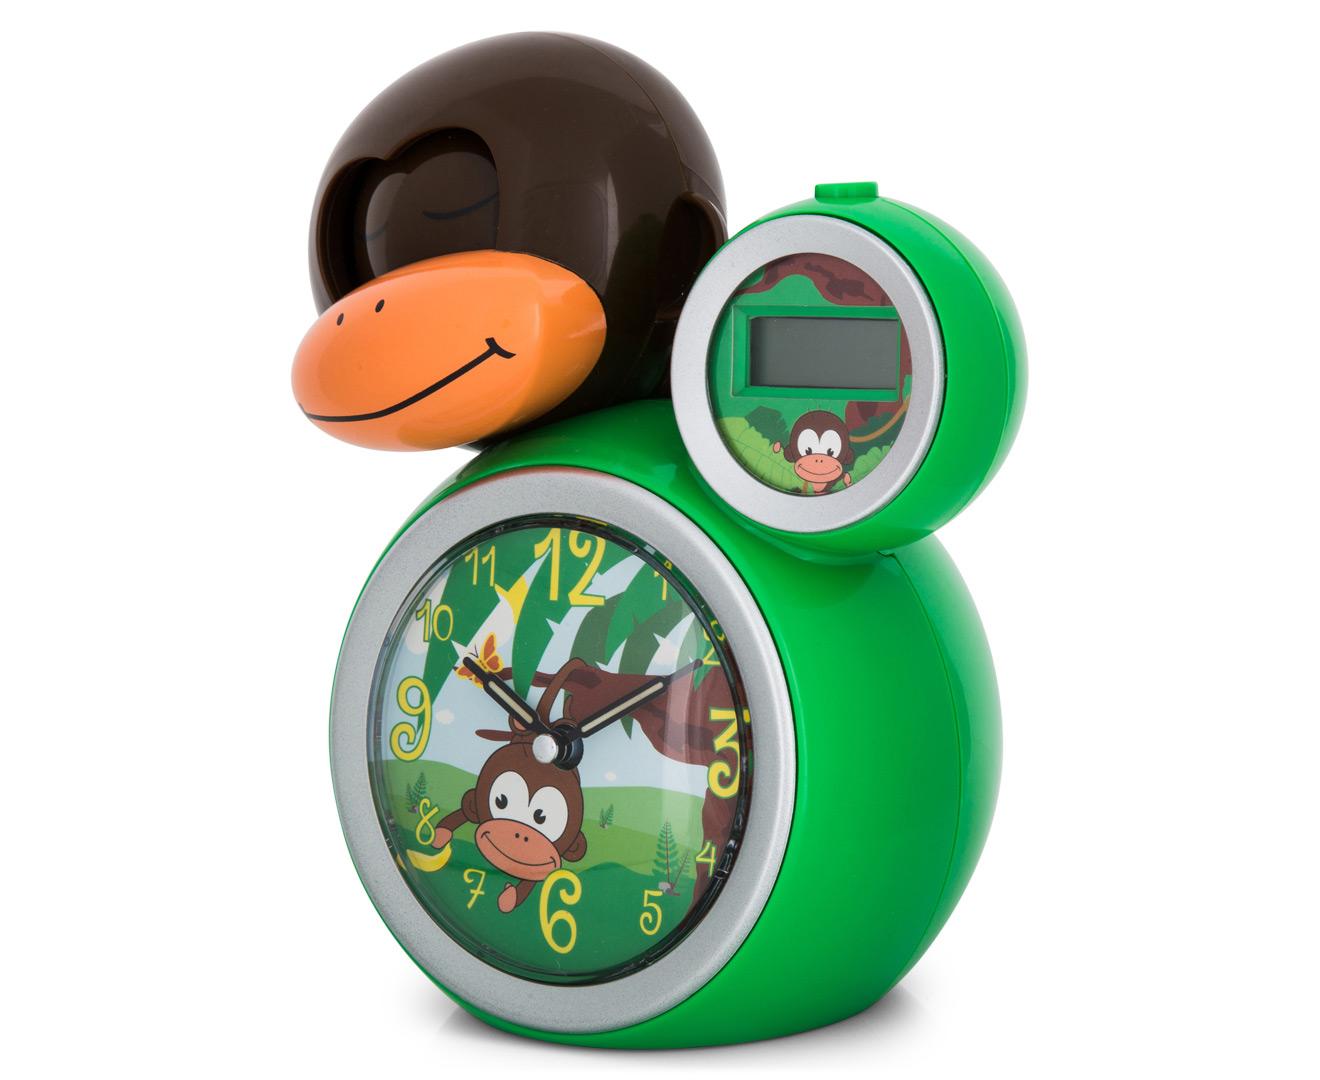 babyzoo sleep trainer clock instructions